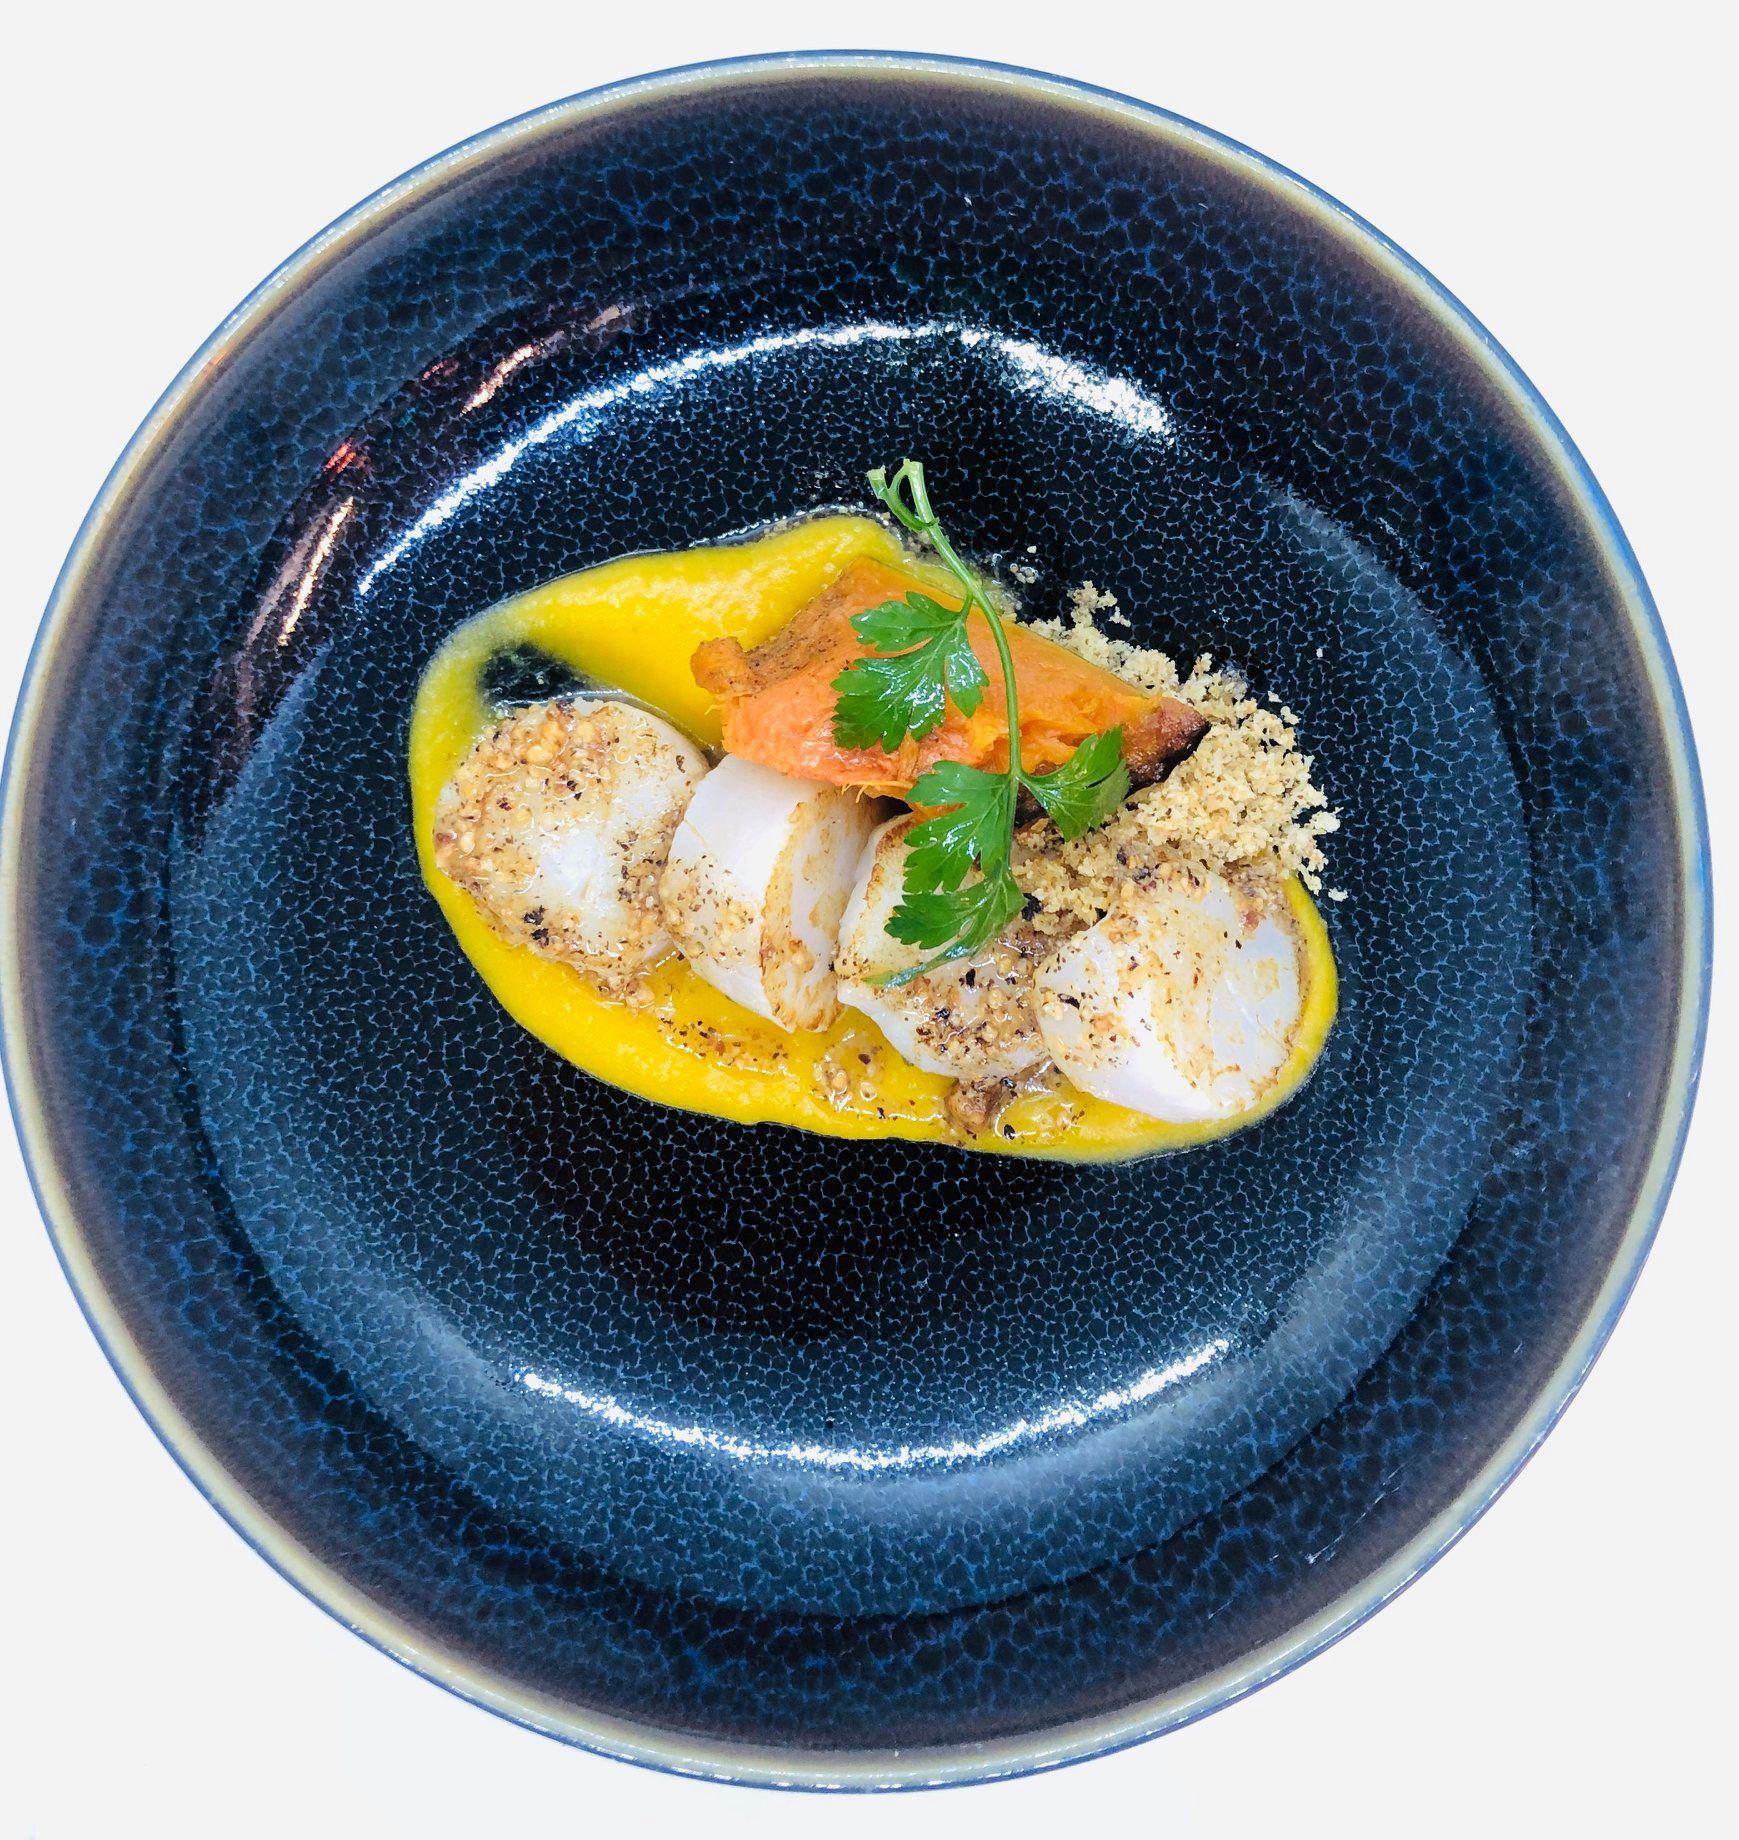 Wallonie : 13 restaurants où commander un menu de Saint-Valentin canon - 5